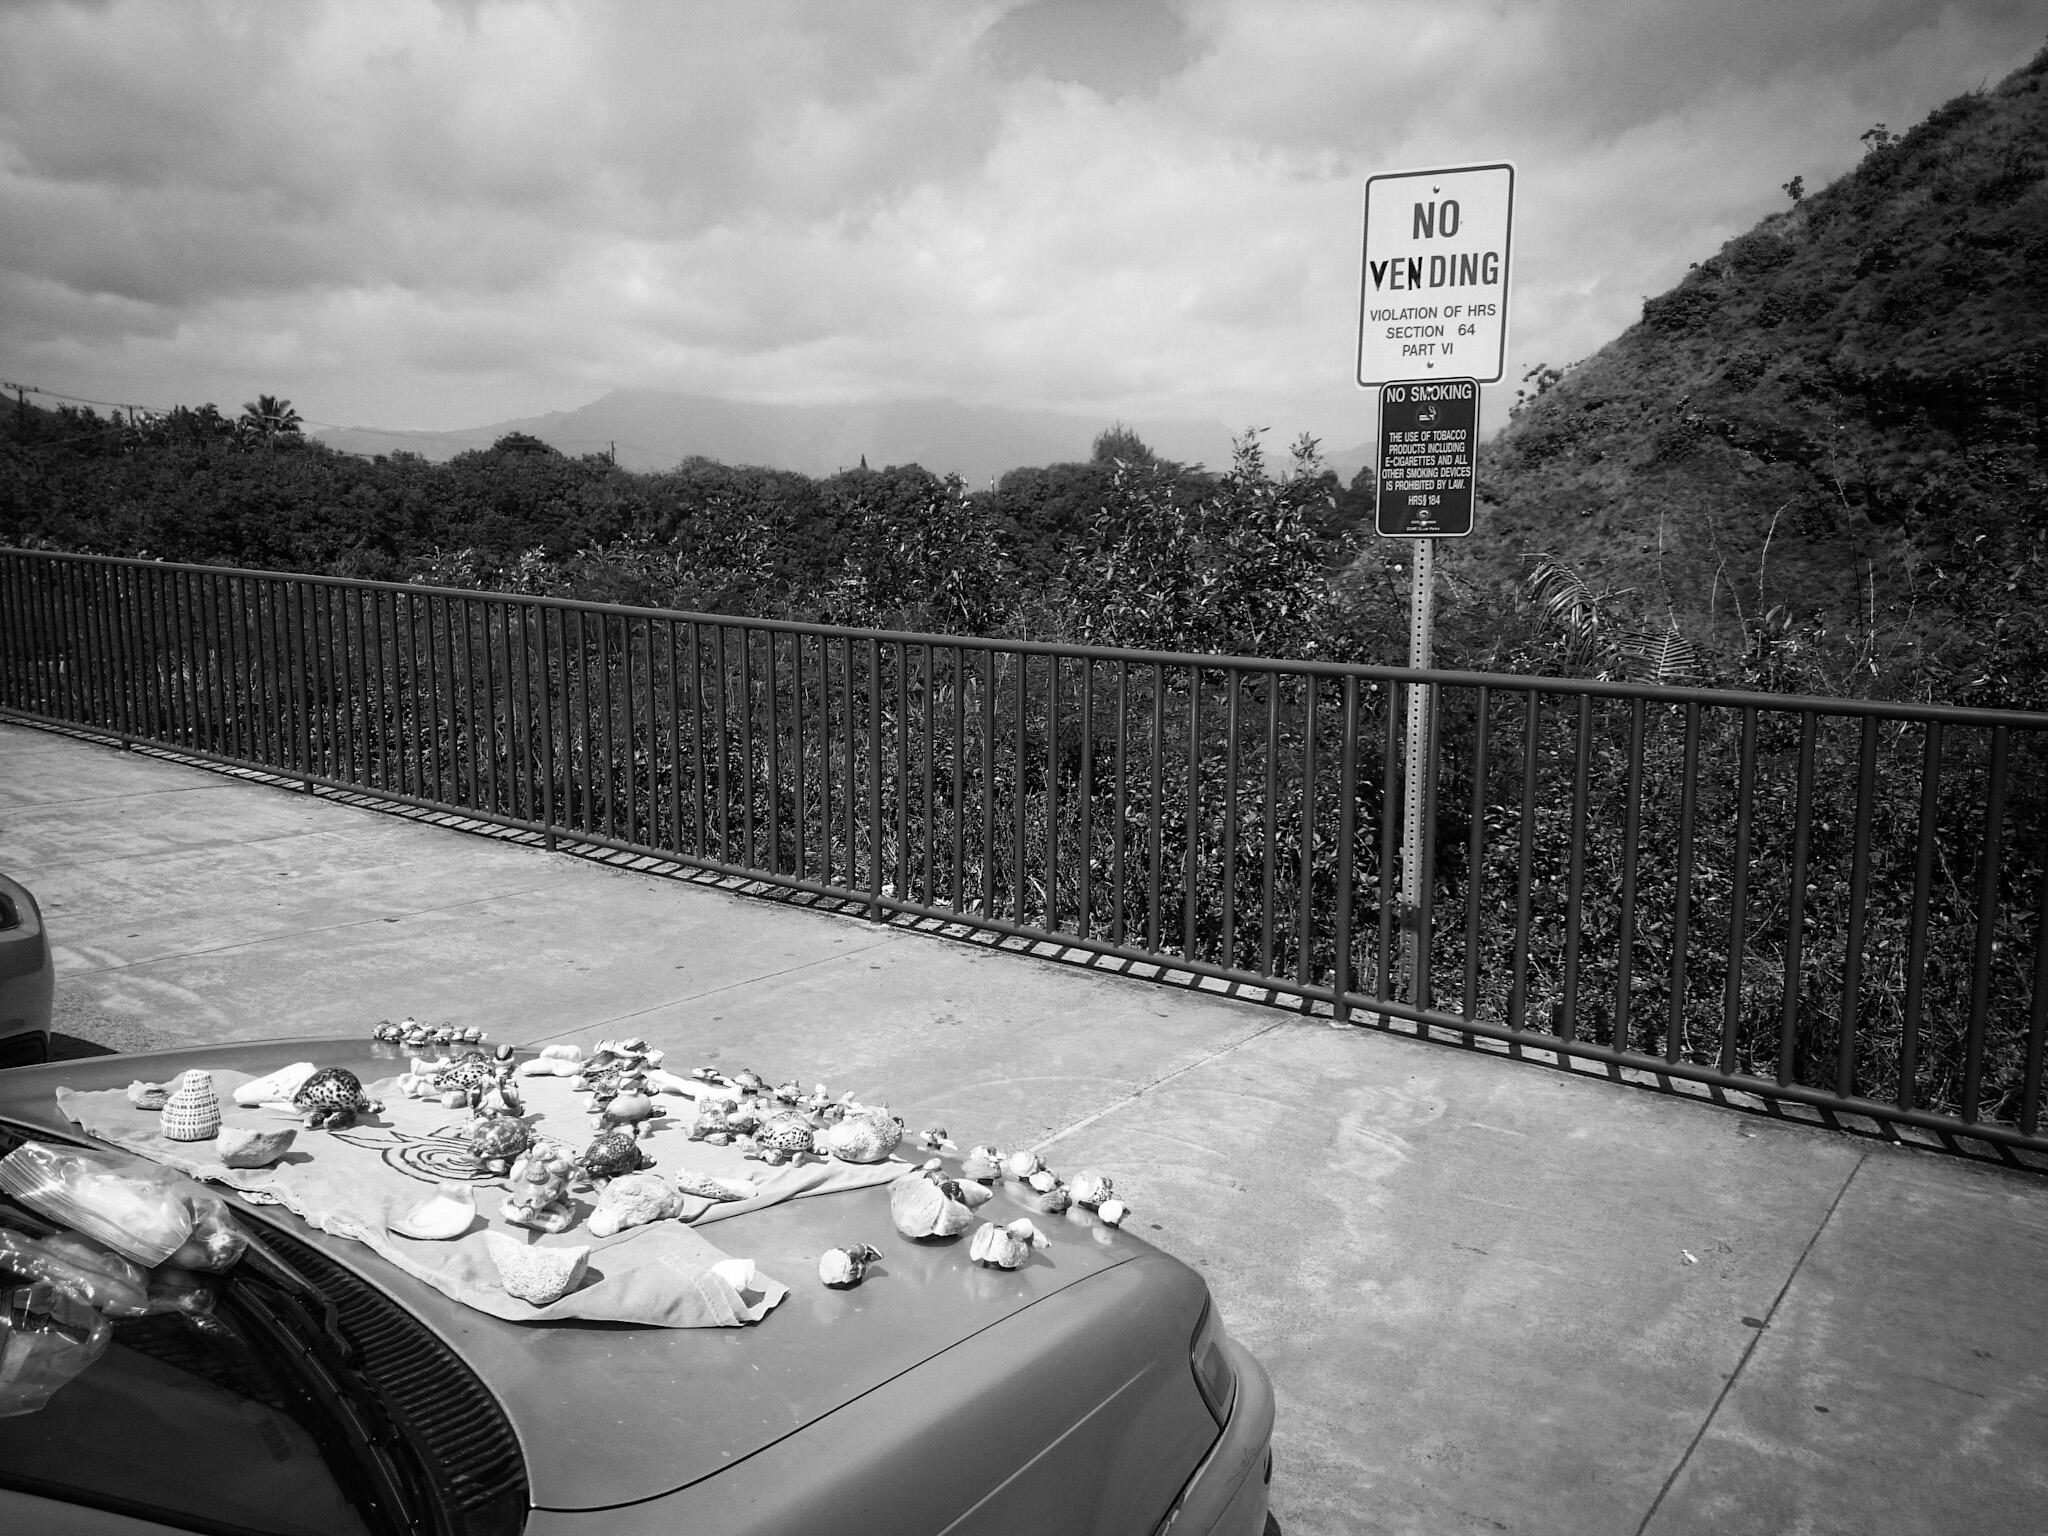 Vending or no vending... Opaeka'a falls, Kauai